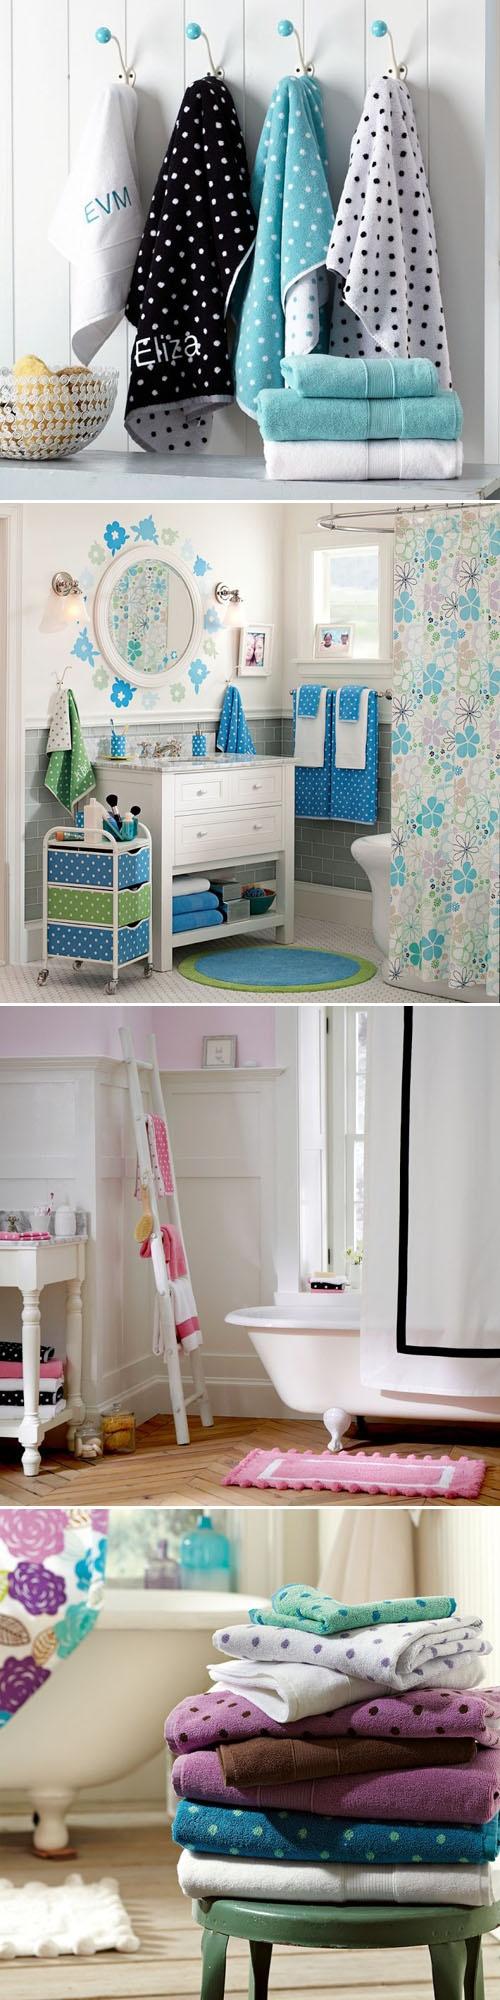 180 best BATHROOMS - Accesories images on Pinterest | Towels ...